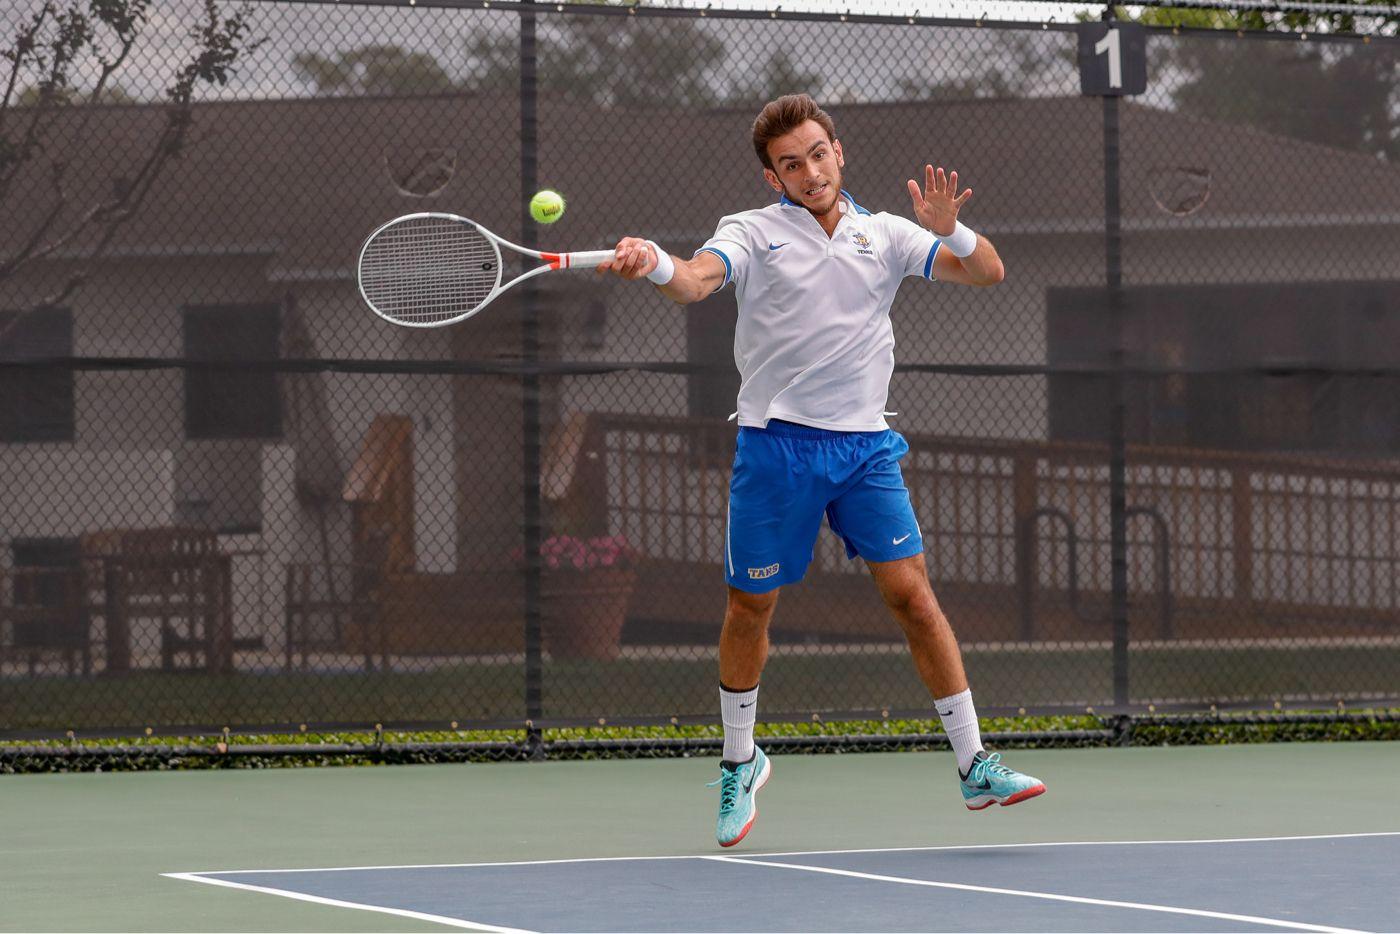 A tennis player hitting a ball during a game.